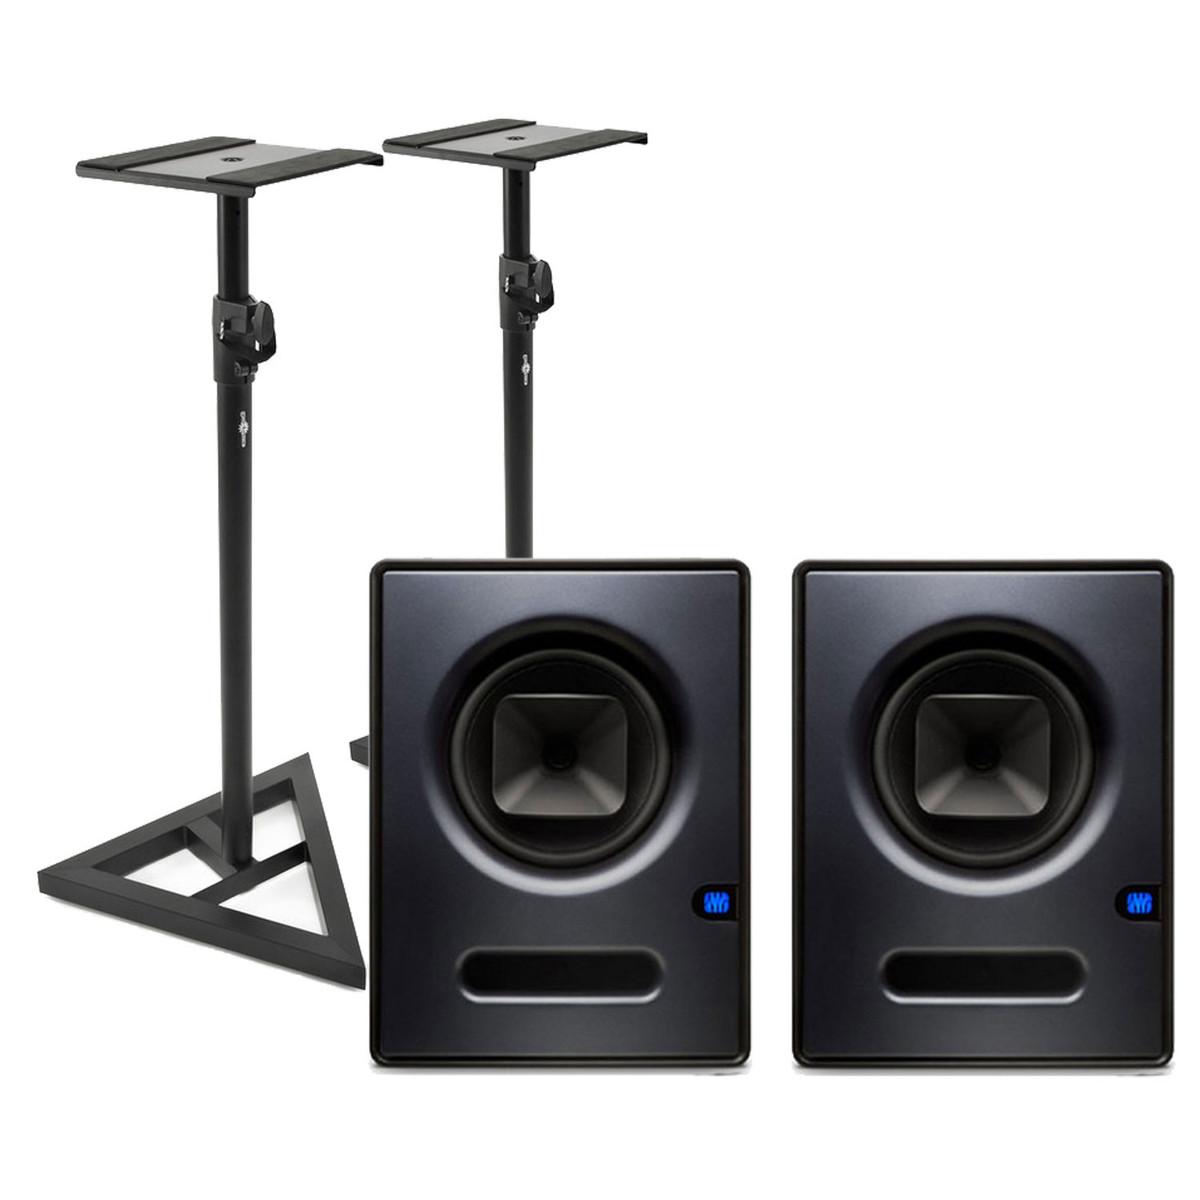 DISC PreSonus Sceptre S8 CoActual Studio Monitors + Free Stands